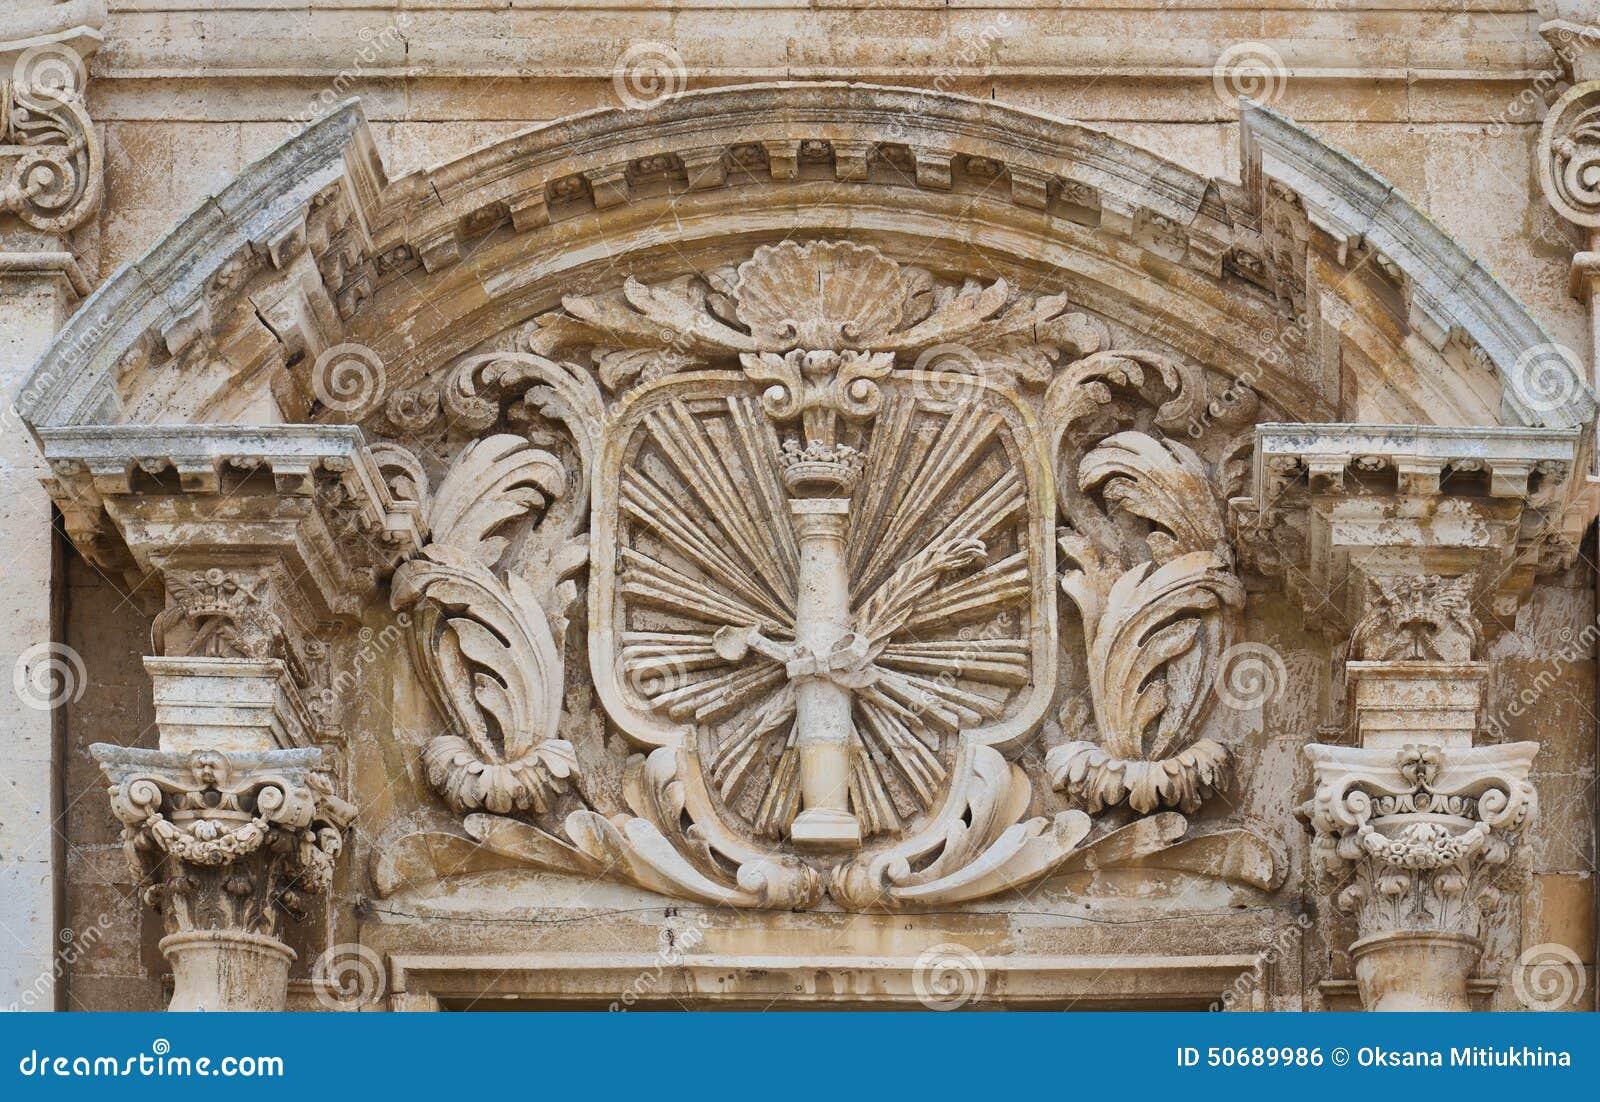 Download 巴洛克式的大厦在古老西勒鸠斯 库存照片. 图片 包括有 大厦, 入口, 造型, 地中海, 拱道, 石头, 西勒鸠斯 - 50689986